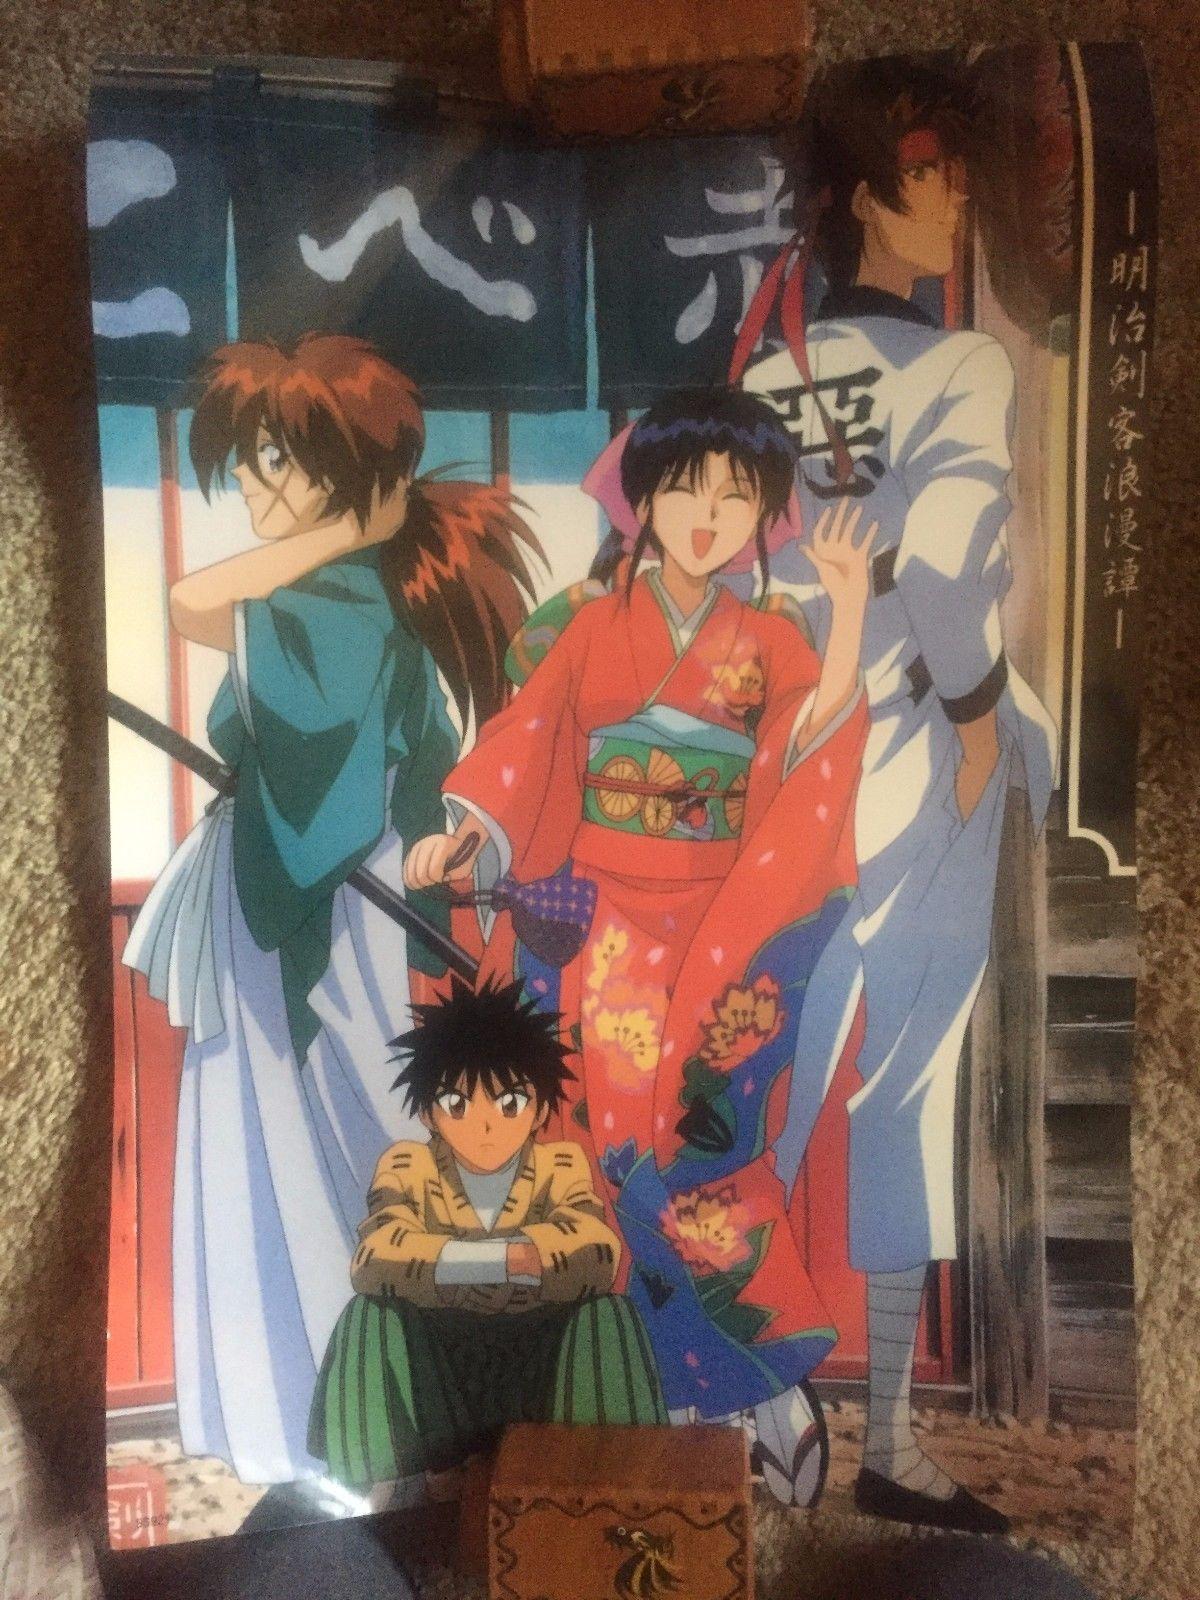 Kenshin vs sanosuke latino dating